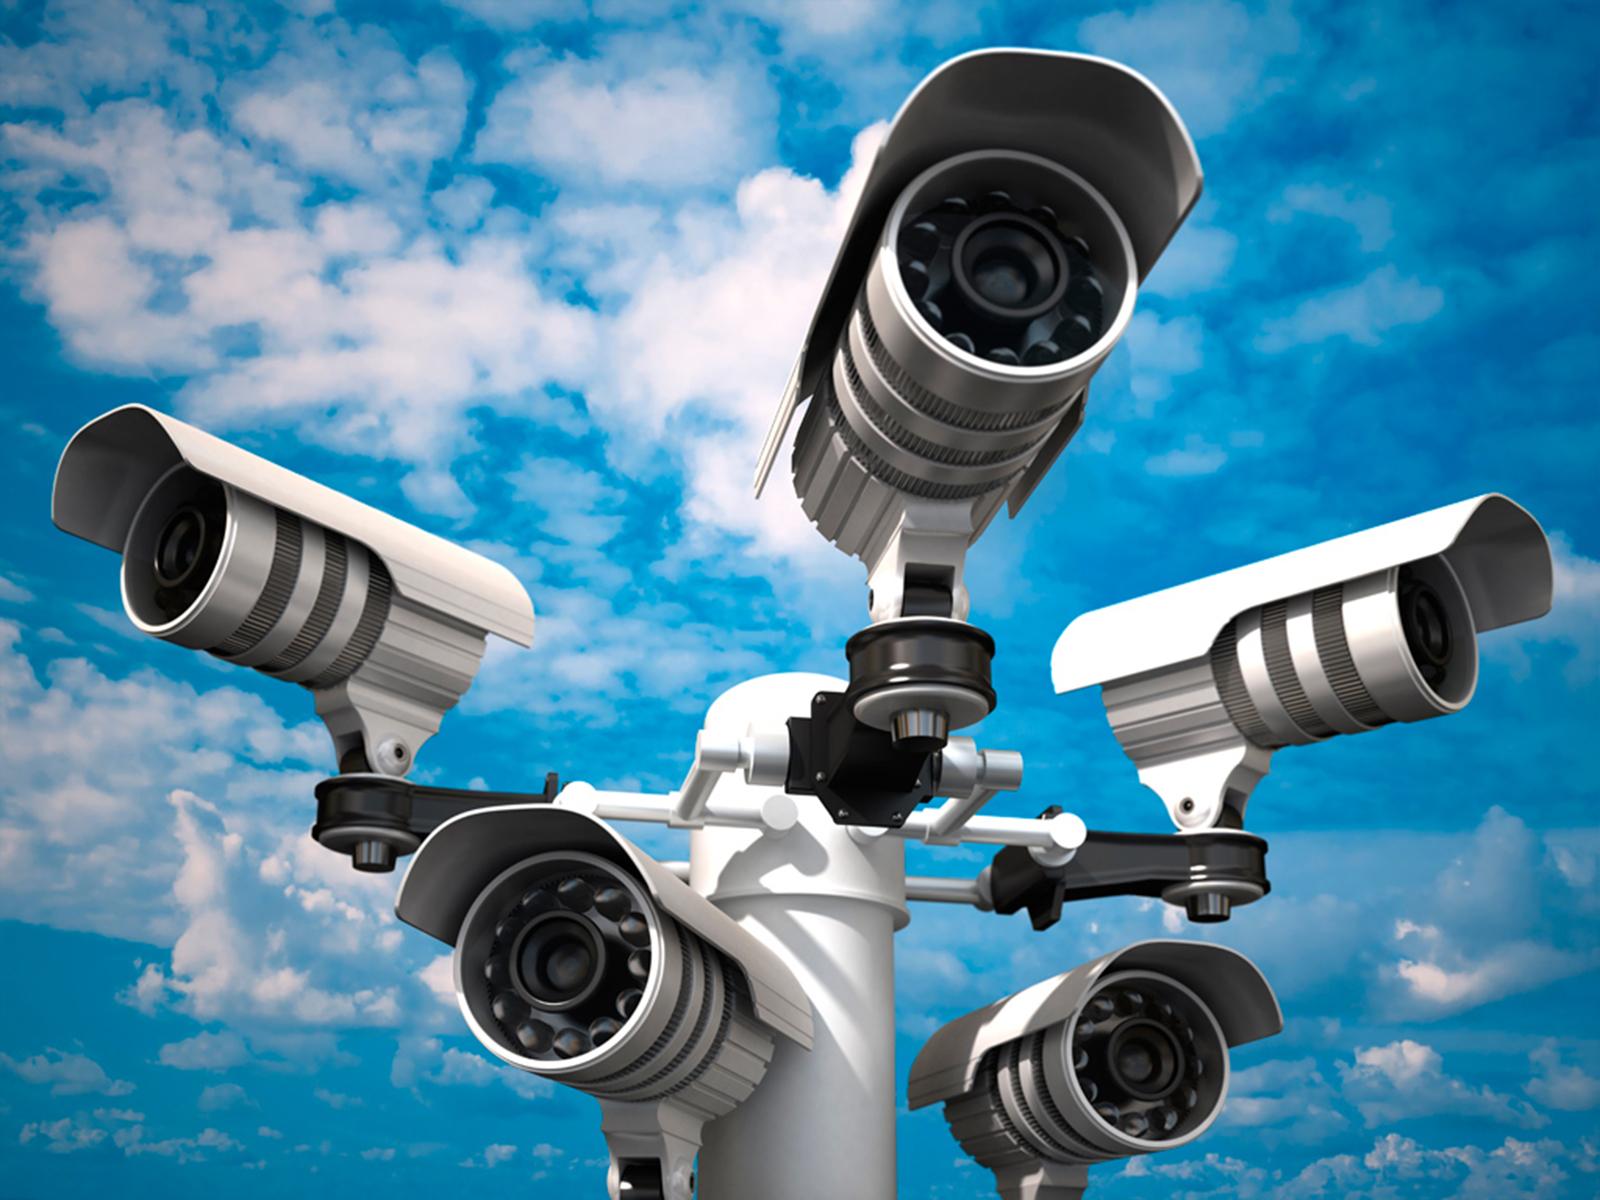 telecamere-videosorveglianza-asmo-rovigo